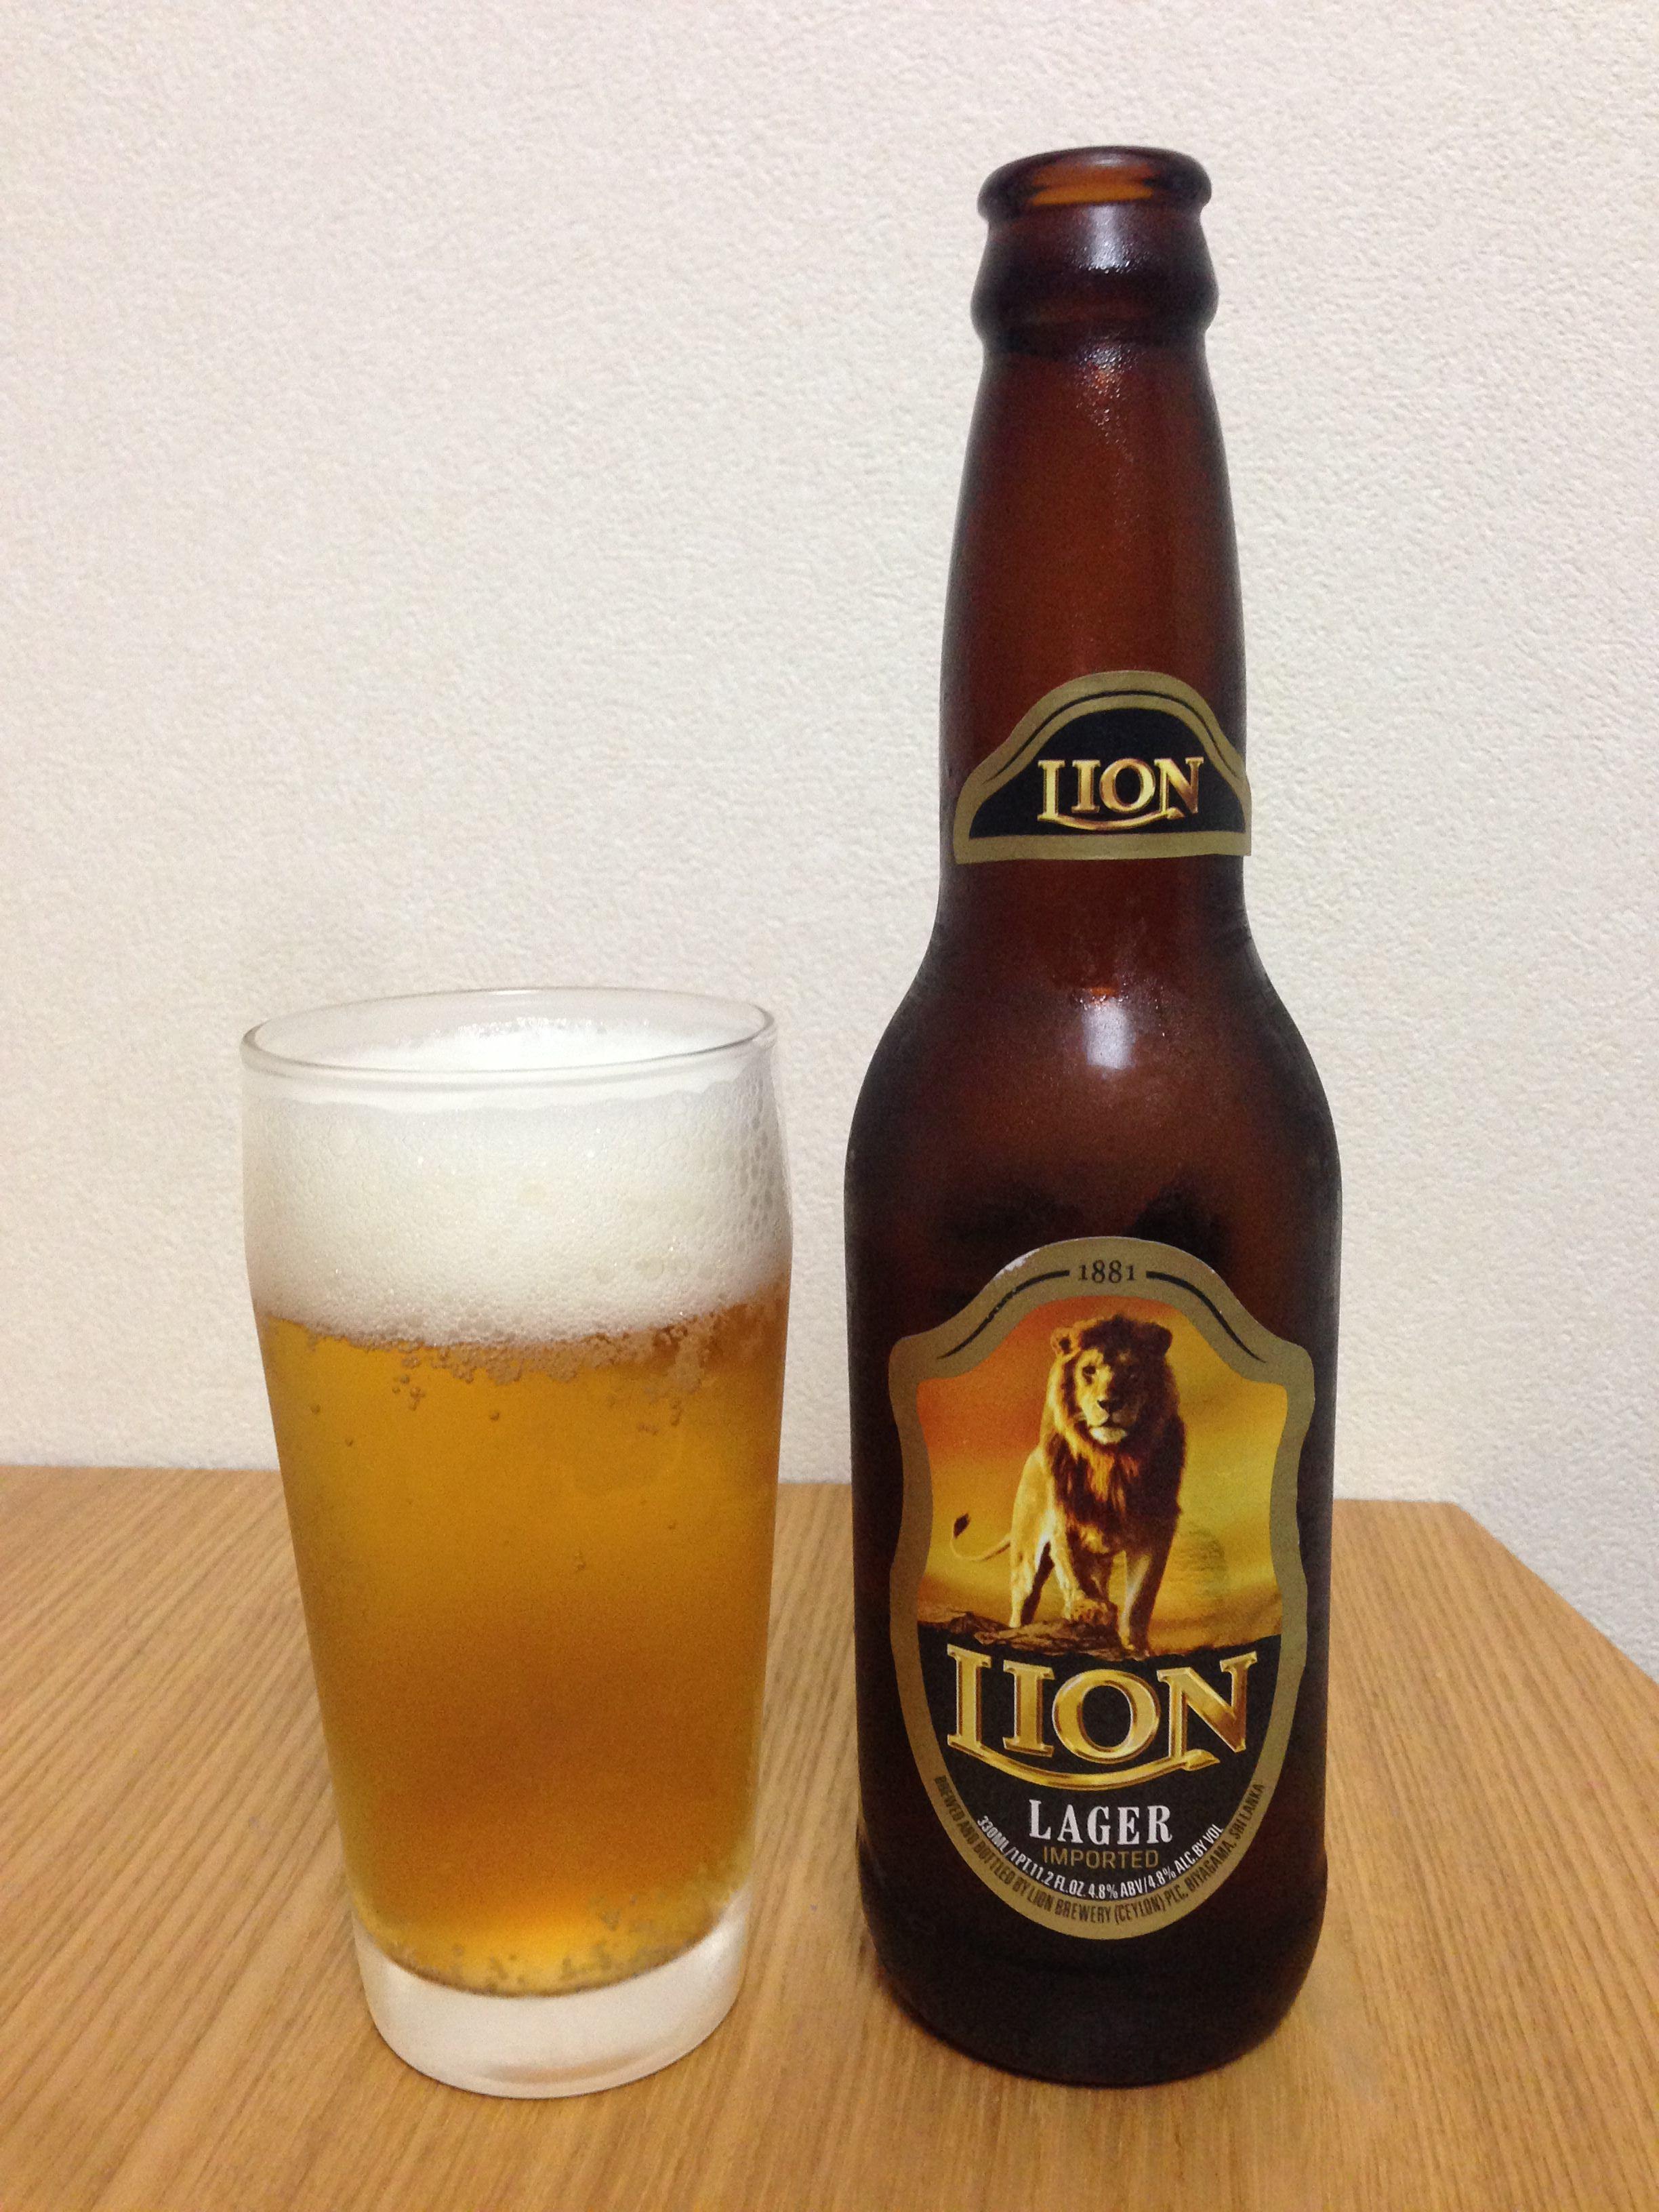 LION LAGER(ライオン ラガー)